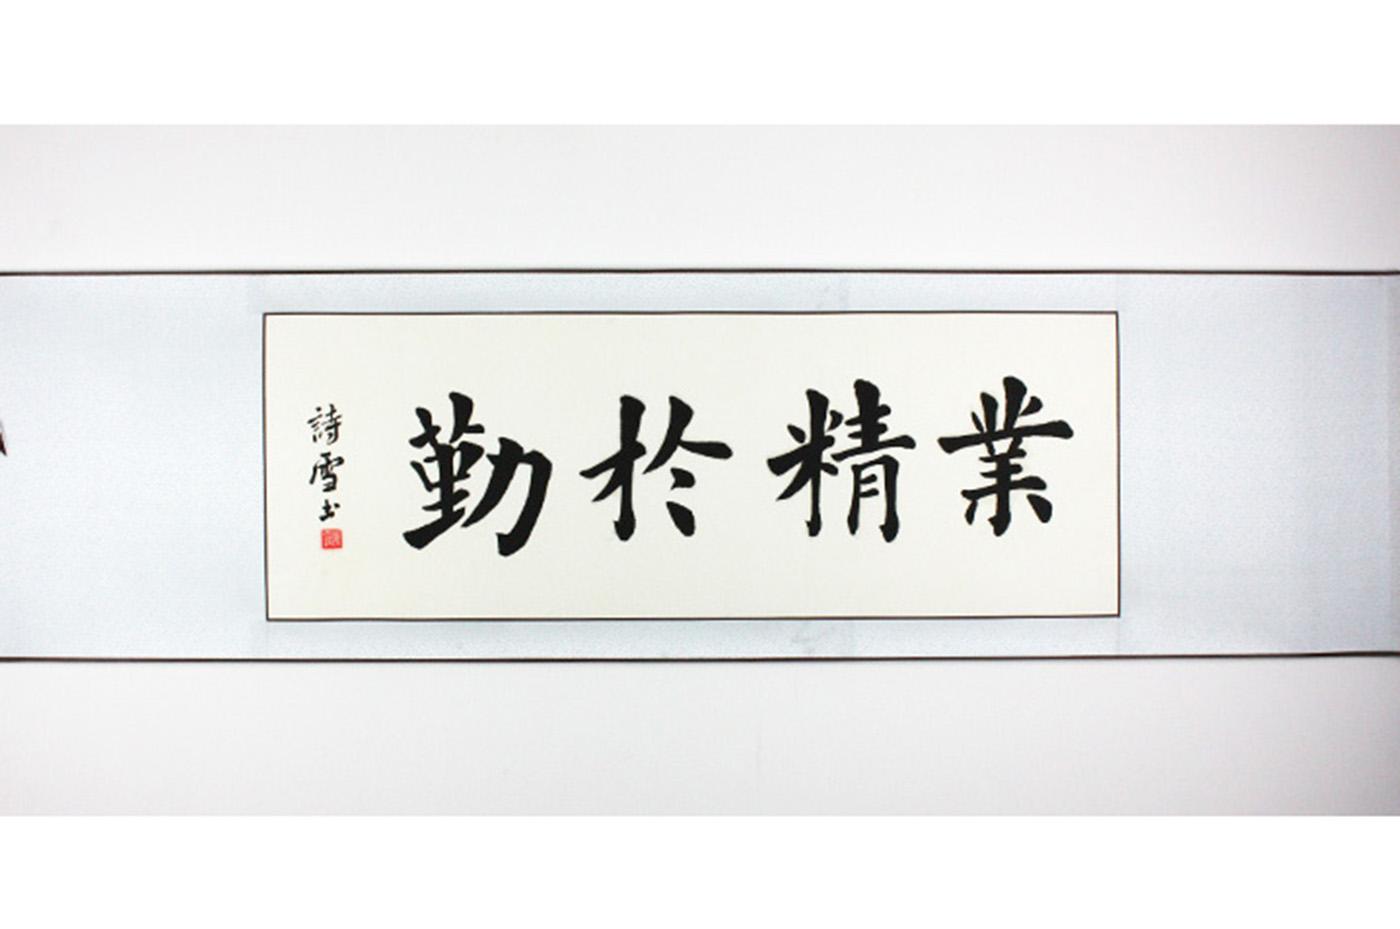 Calligraphie diligences